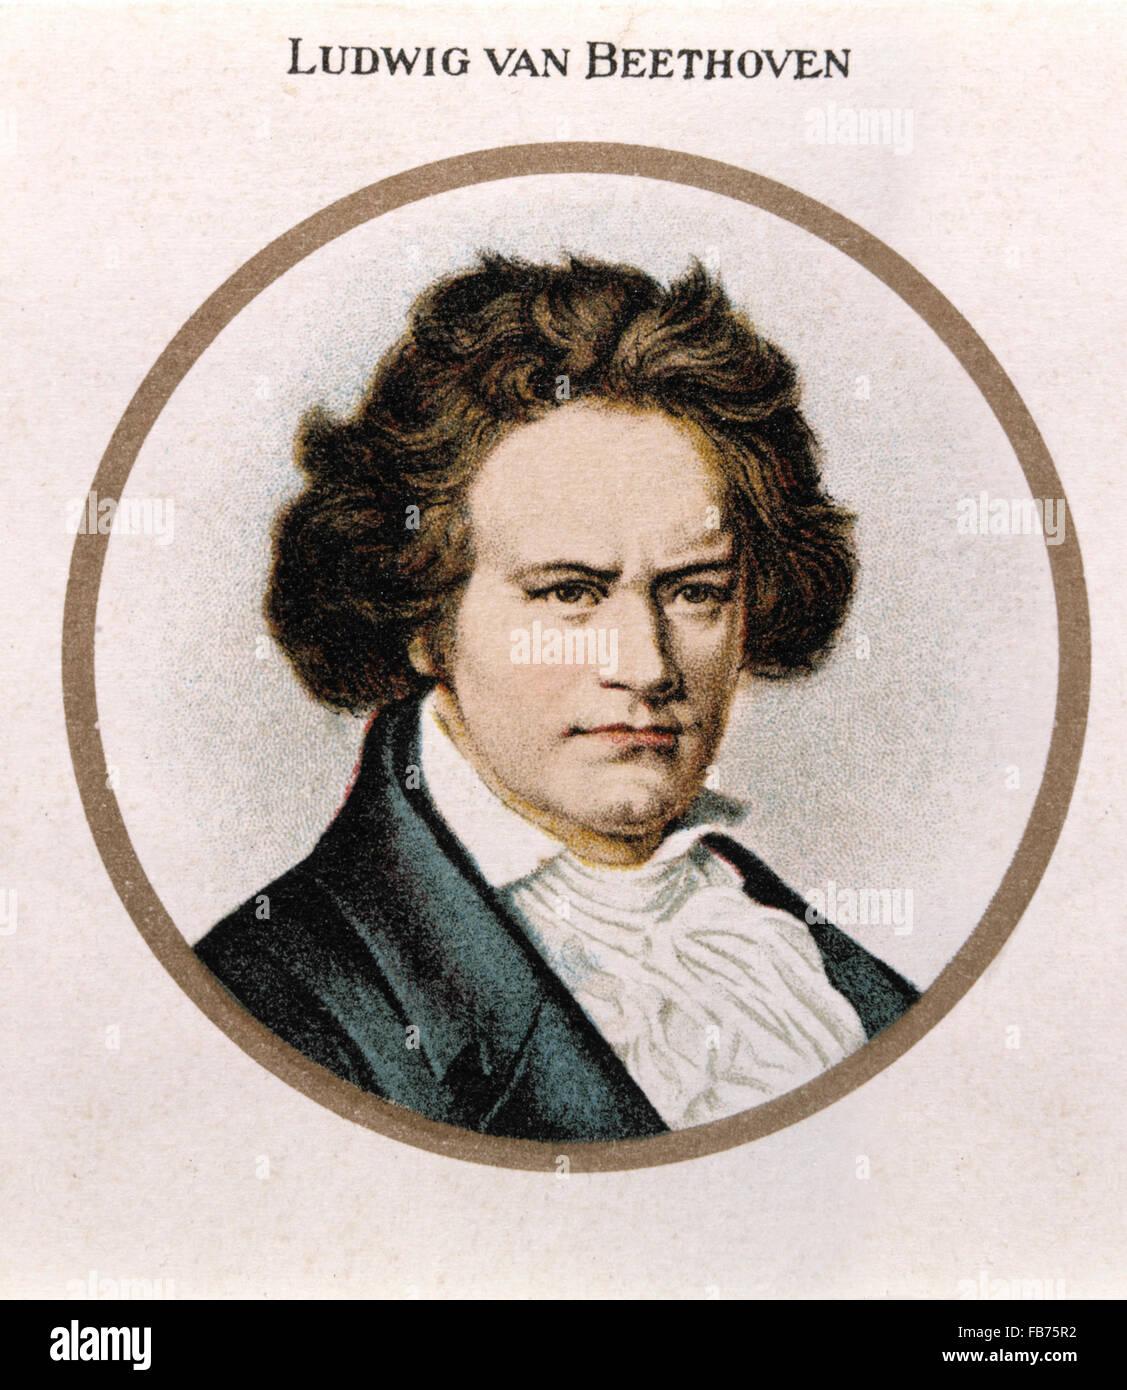 Ludwig van Beethoven (1770-1827), German Composer - Stock Image